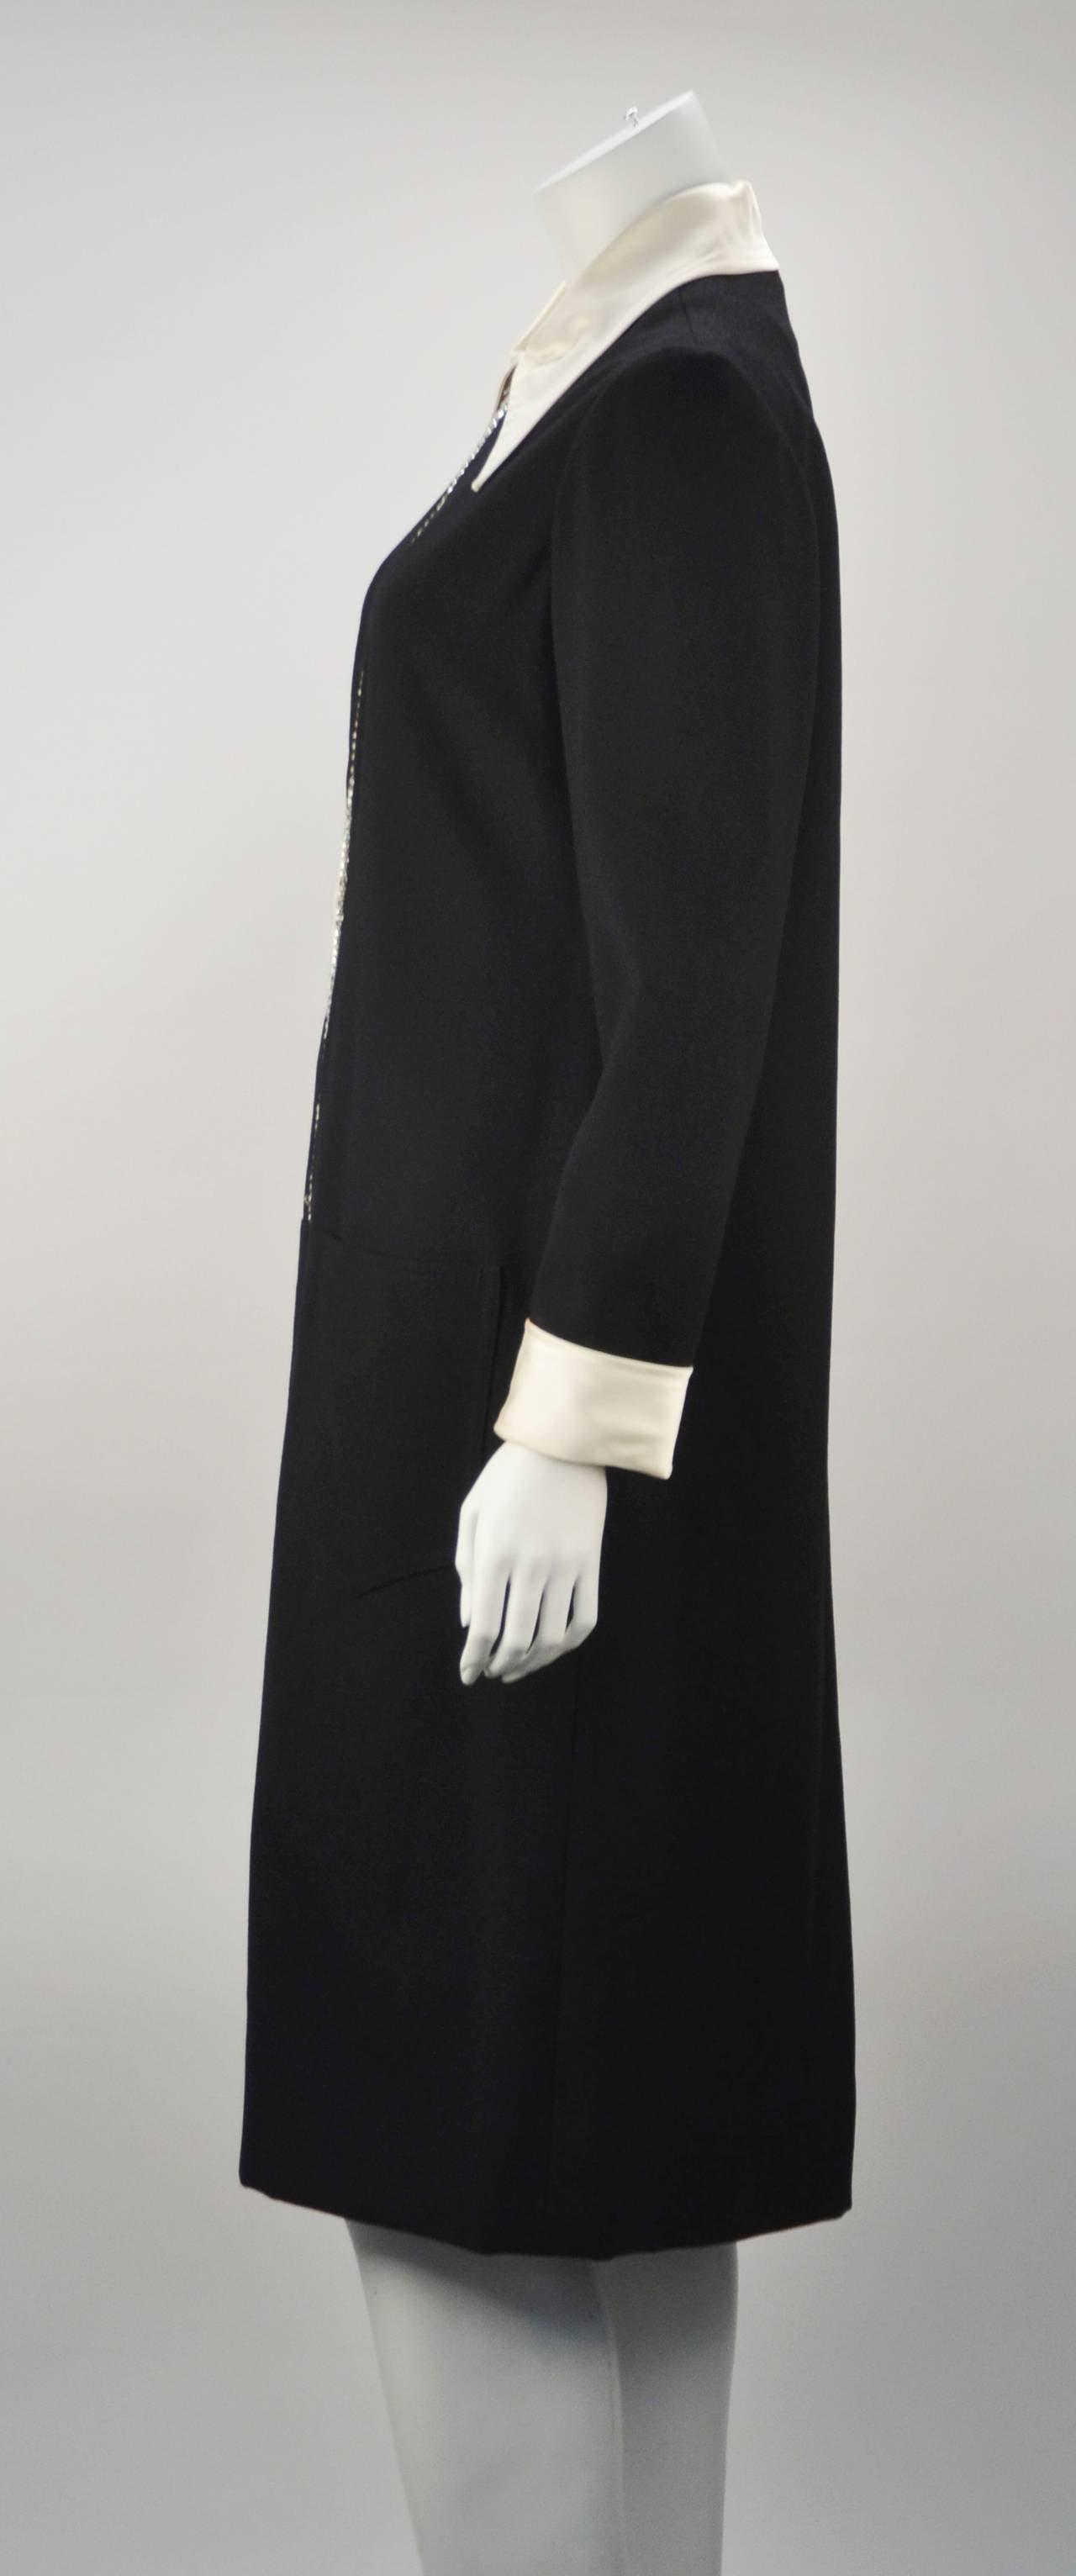 1970s Oscar de La Renta Black Jeweled Center Dress In Excellent Condition For Sale In Houston, TX